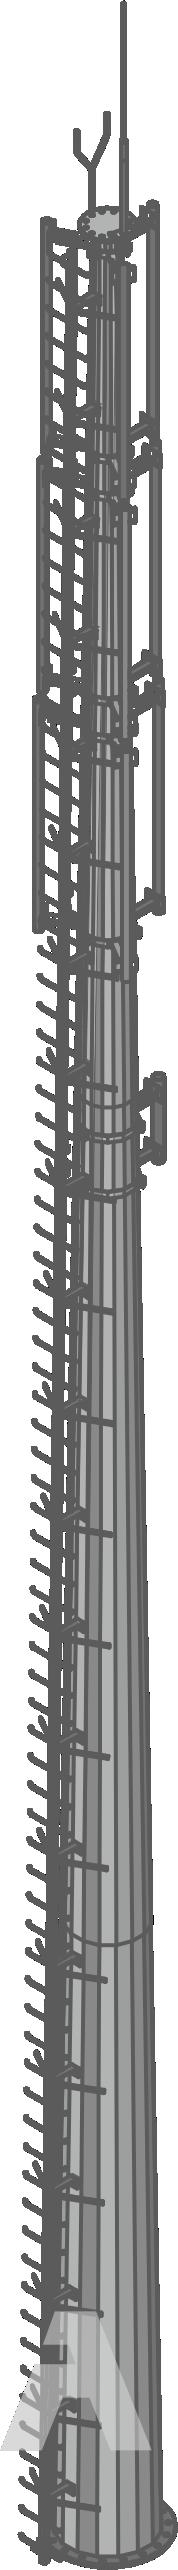 Radio masts.  Cellular communication pole (RMG)